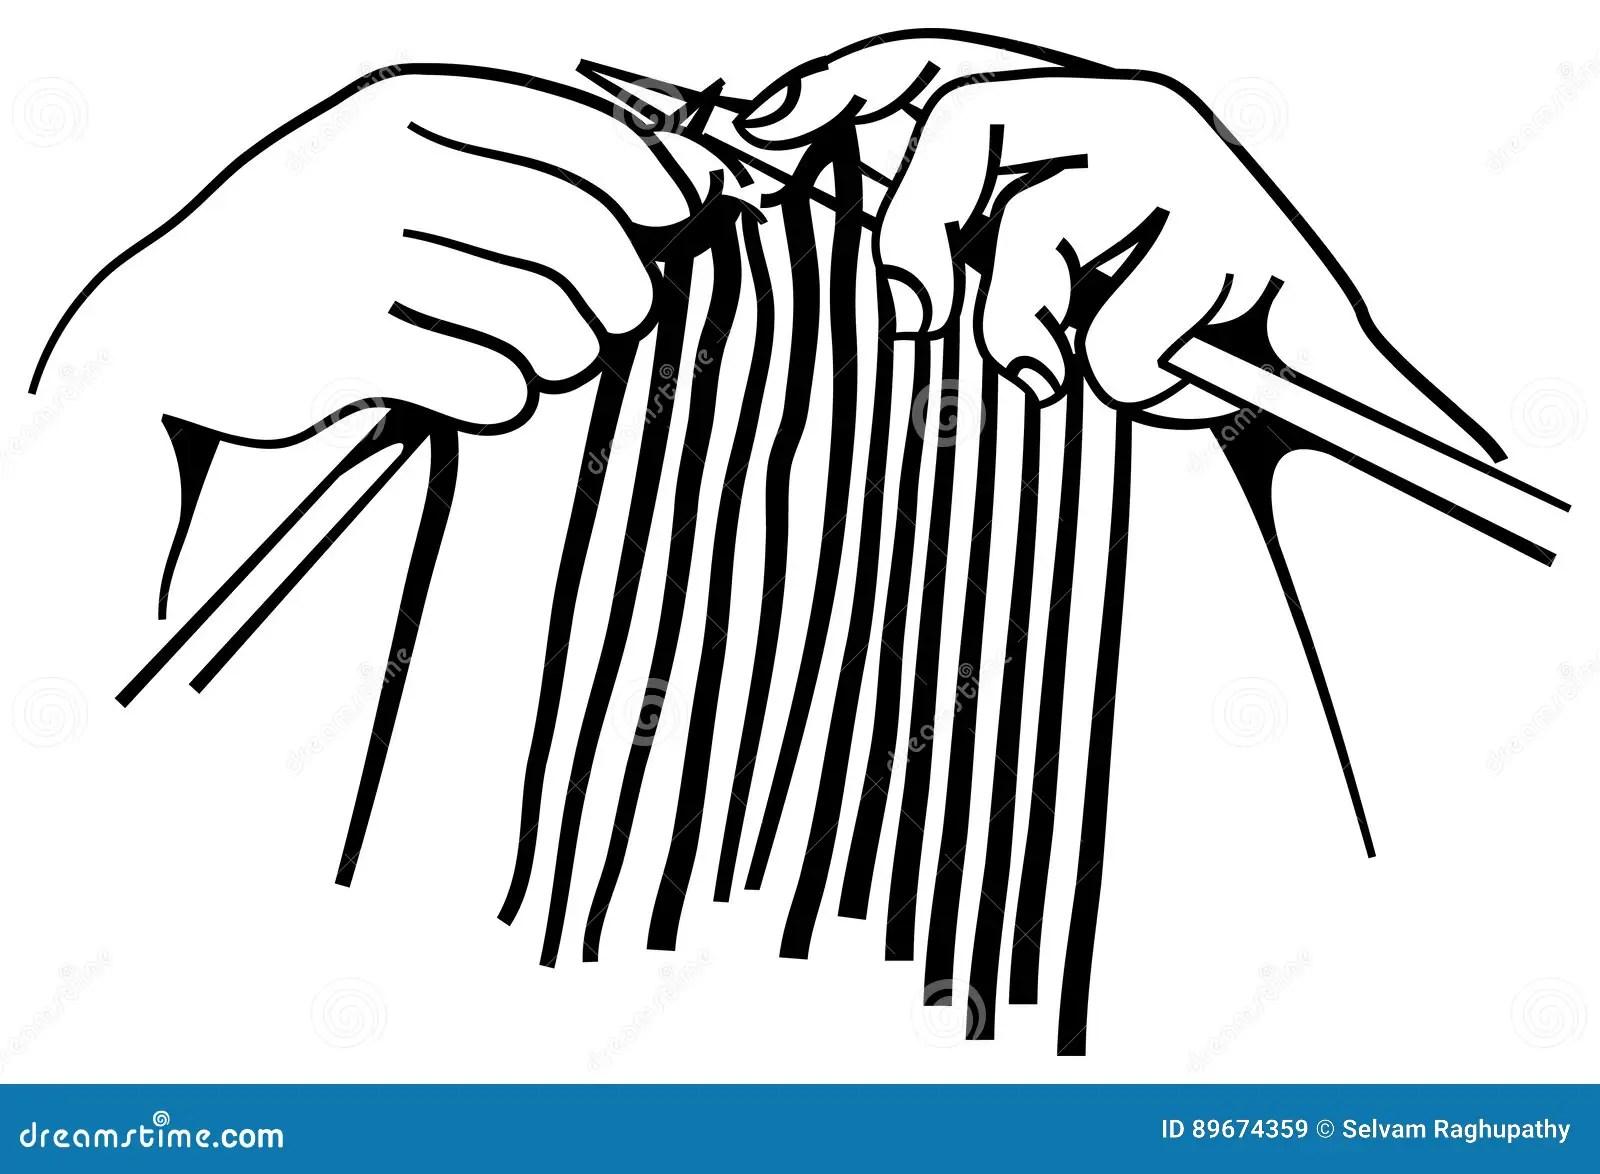 Arthritic Cartoons Illustrations Amp Vector Stock Images